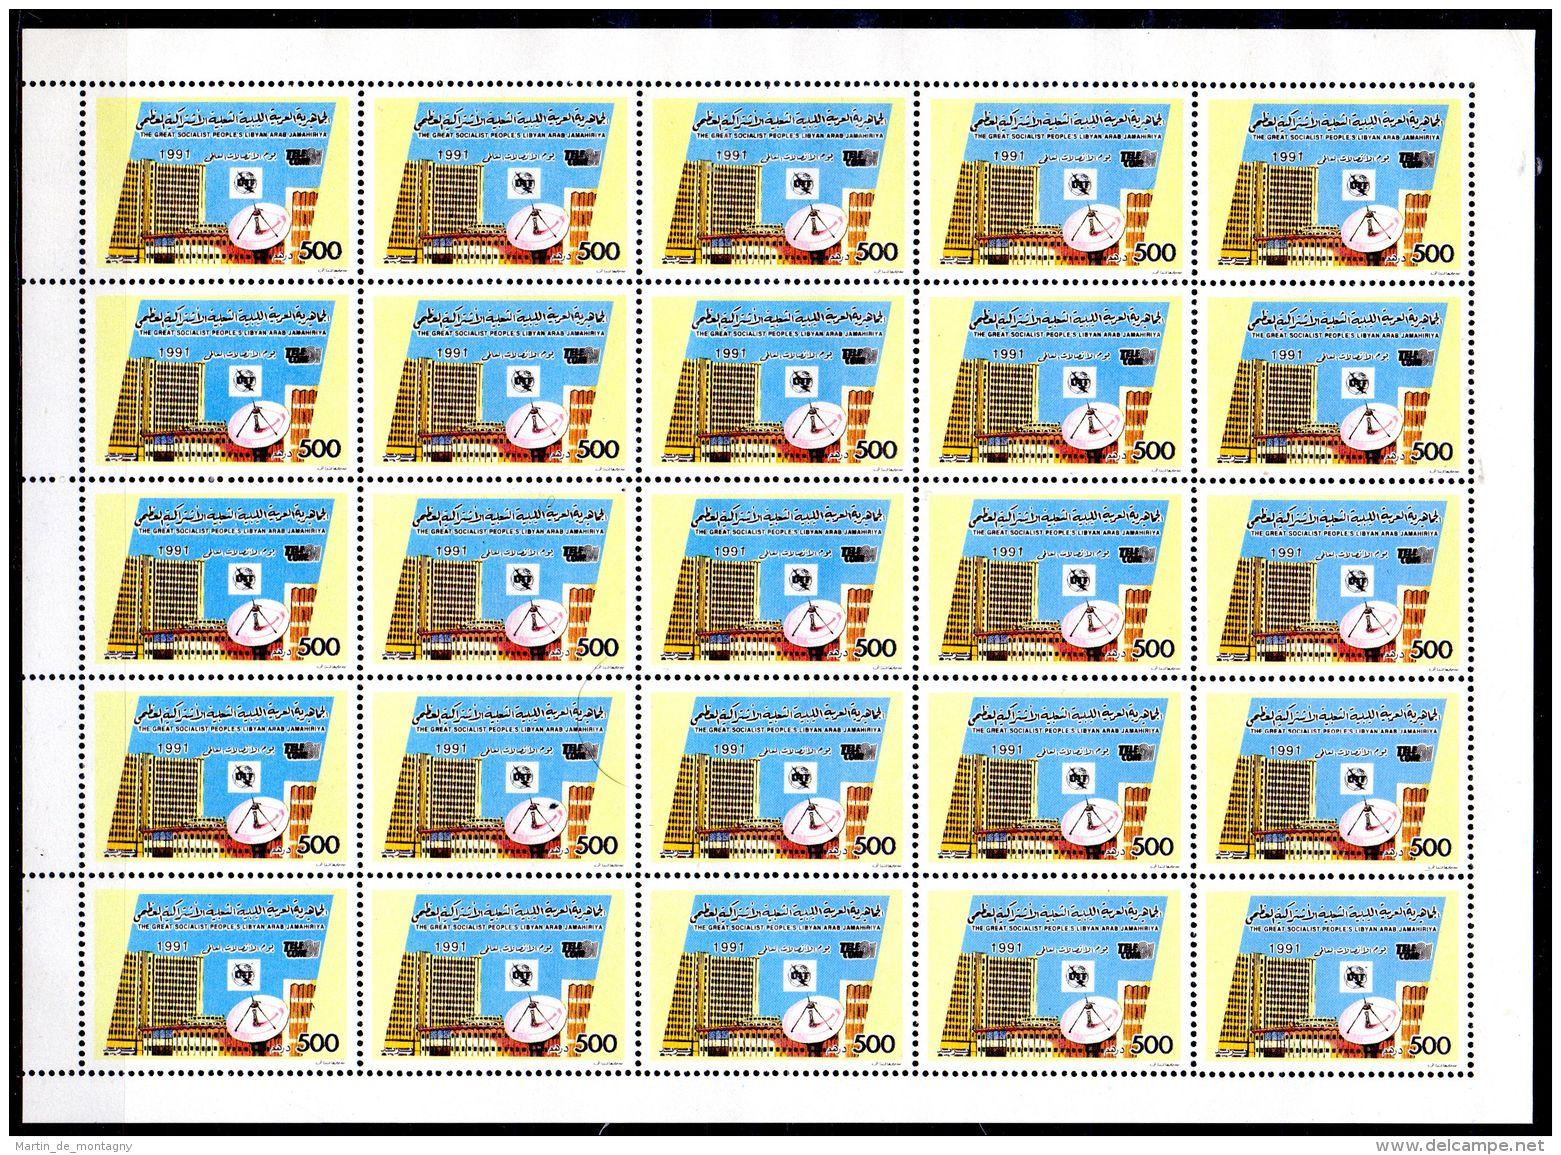 7.10.1991; Telecom 91 , Druckphase, Mi-Nr. 1869 Im Bogen; Los 49947 - Libyen